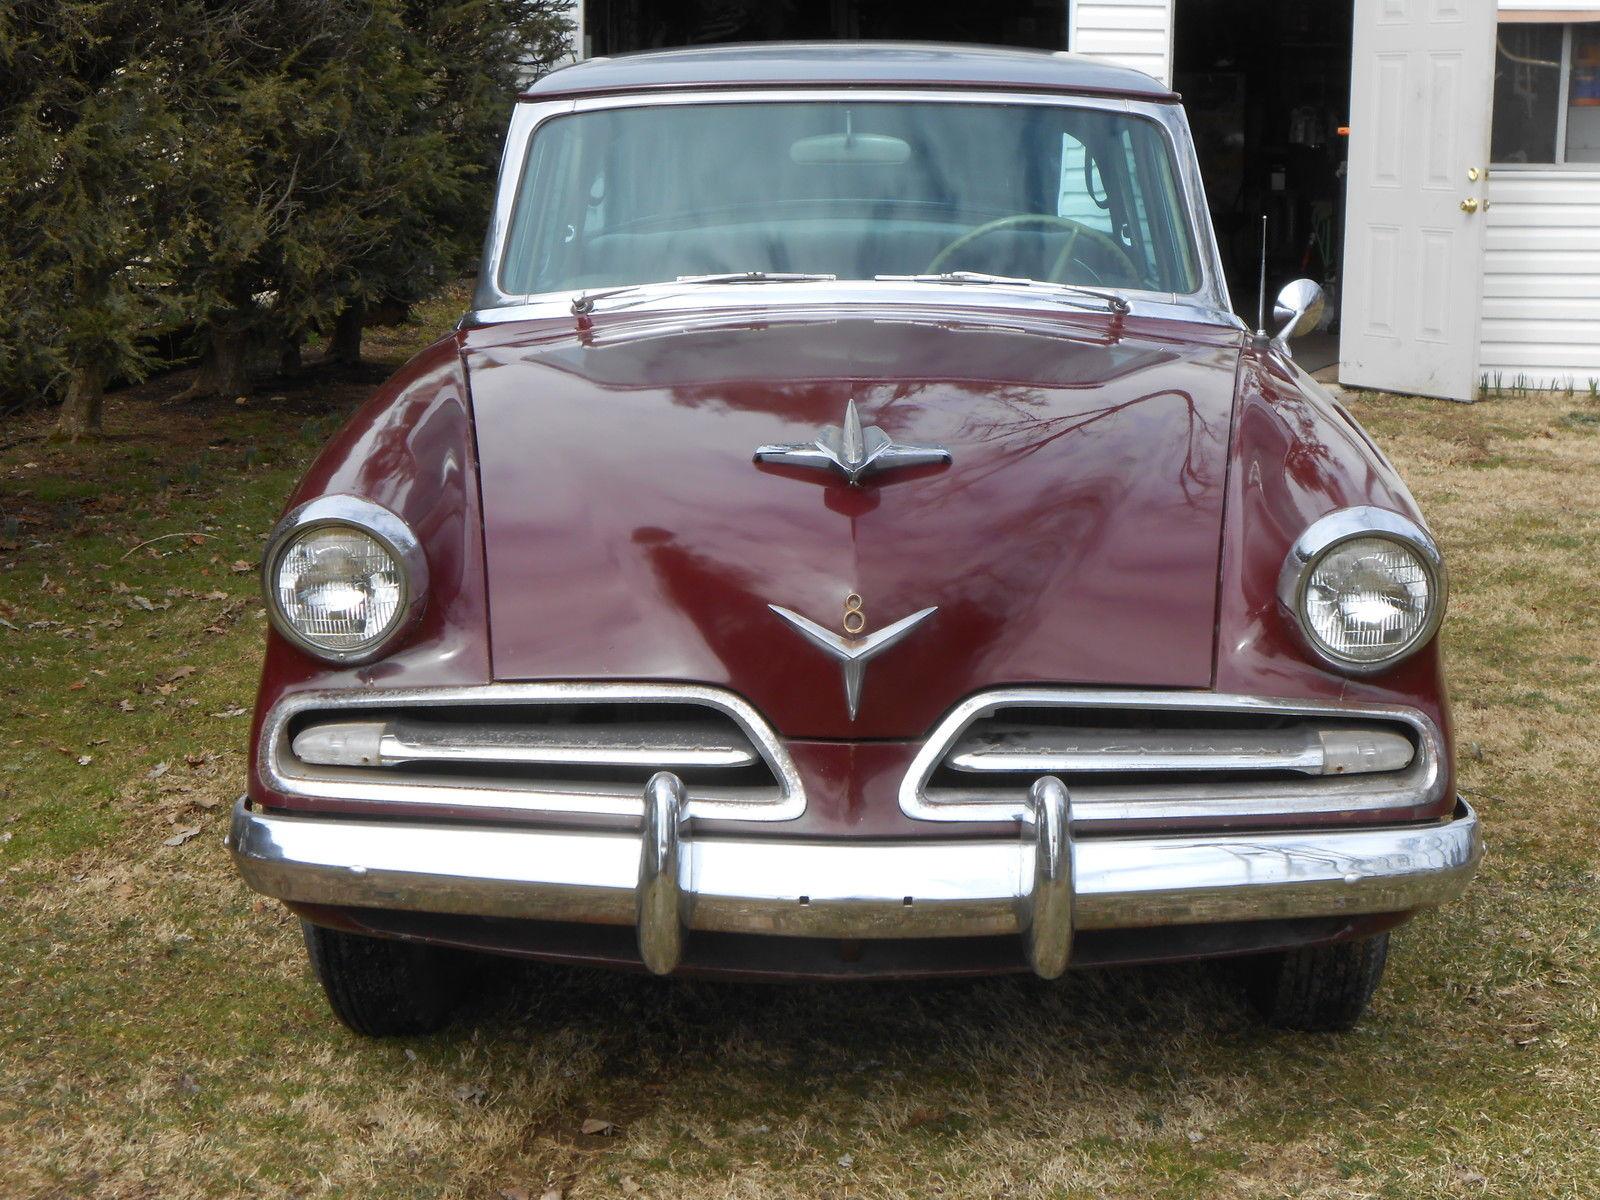 All american classic cars 1953 hudson hornet 2 door club coupe - All American Classic Cars 1953 Studebaker Commander Land